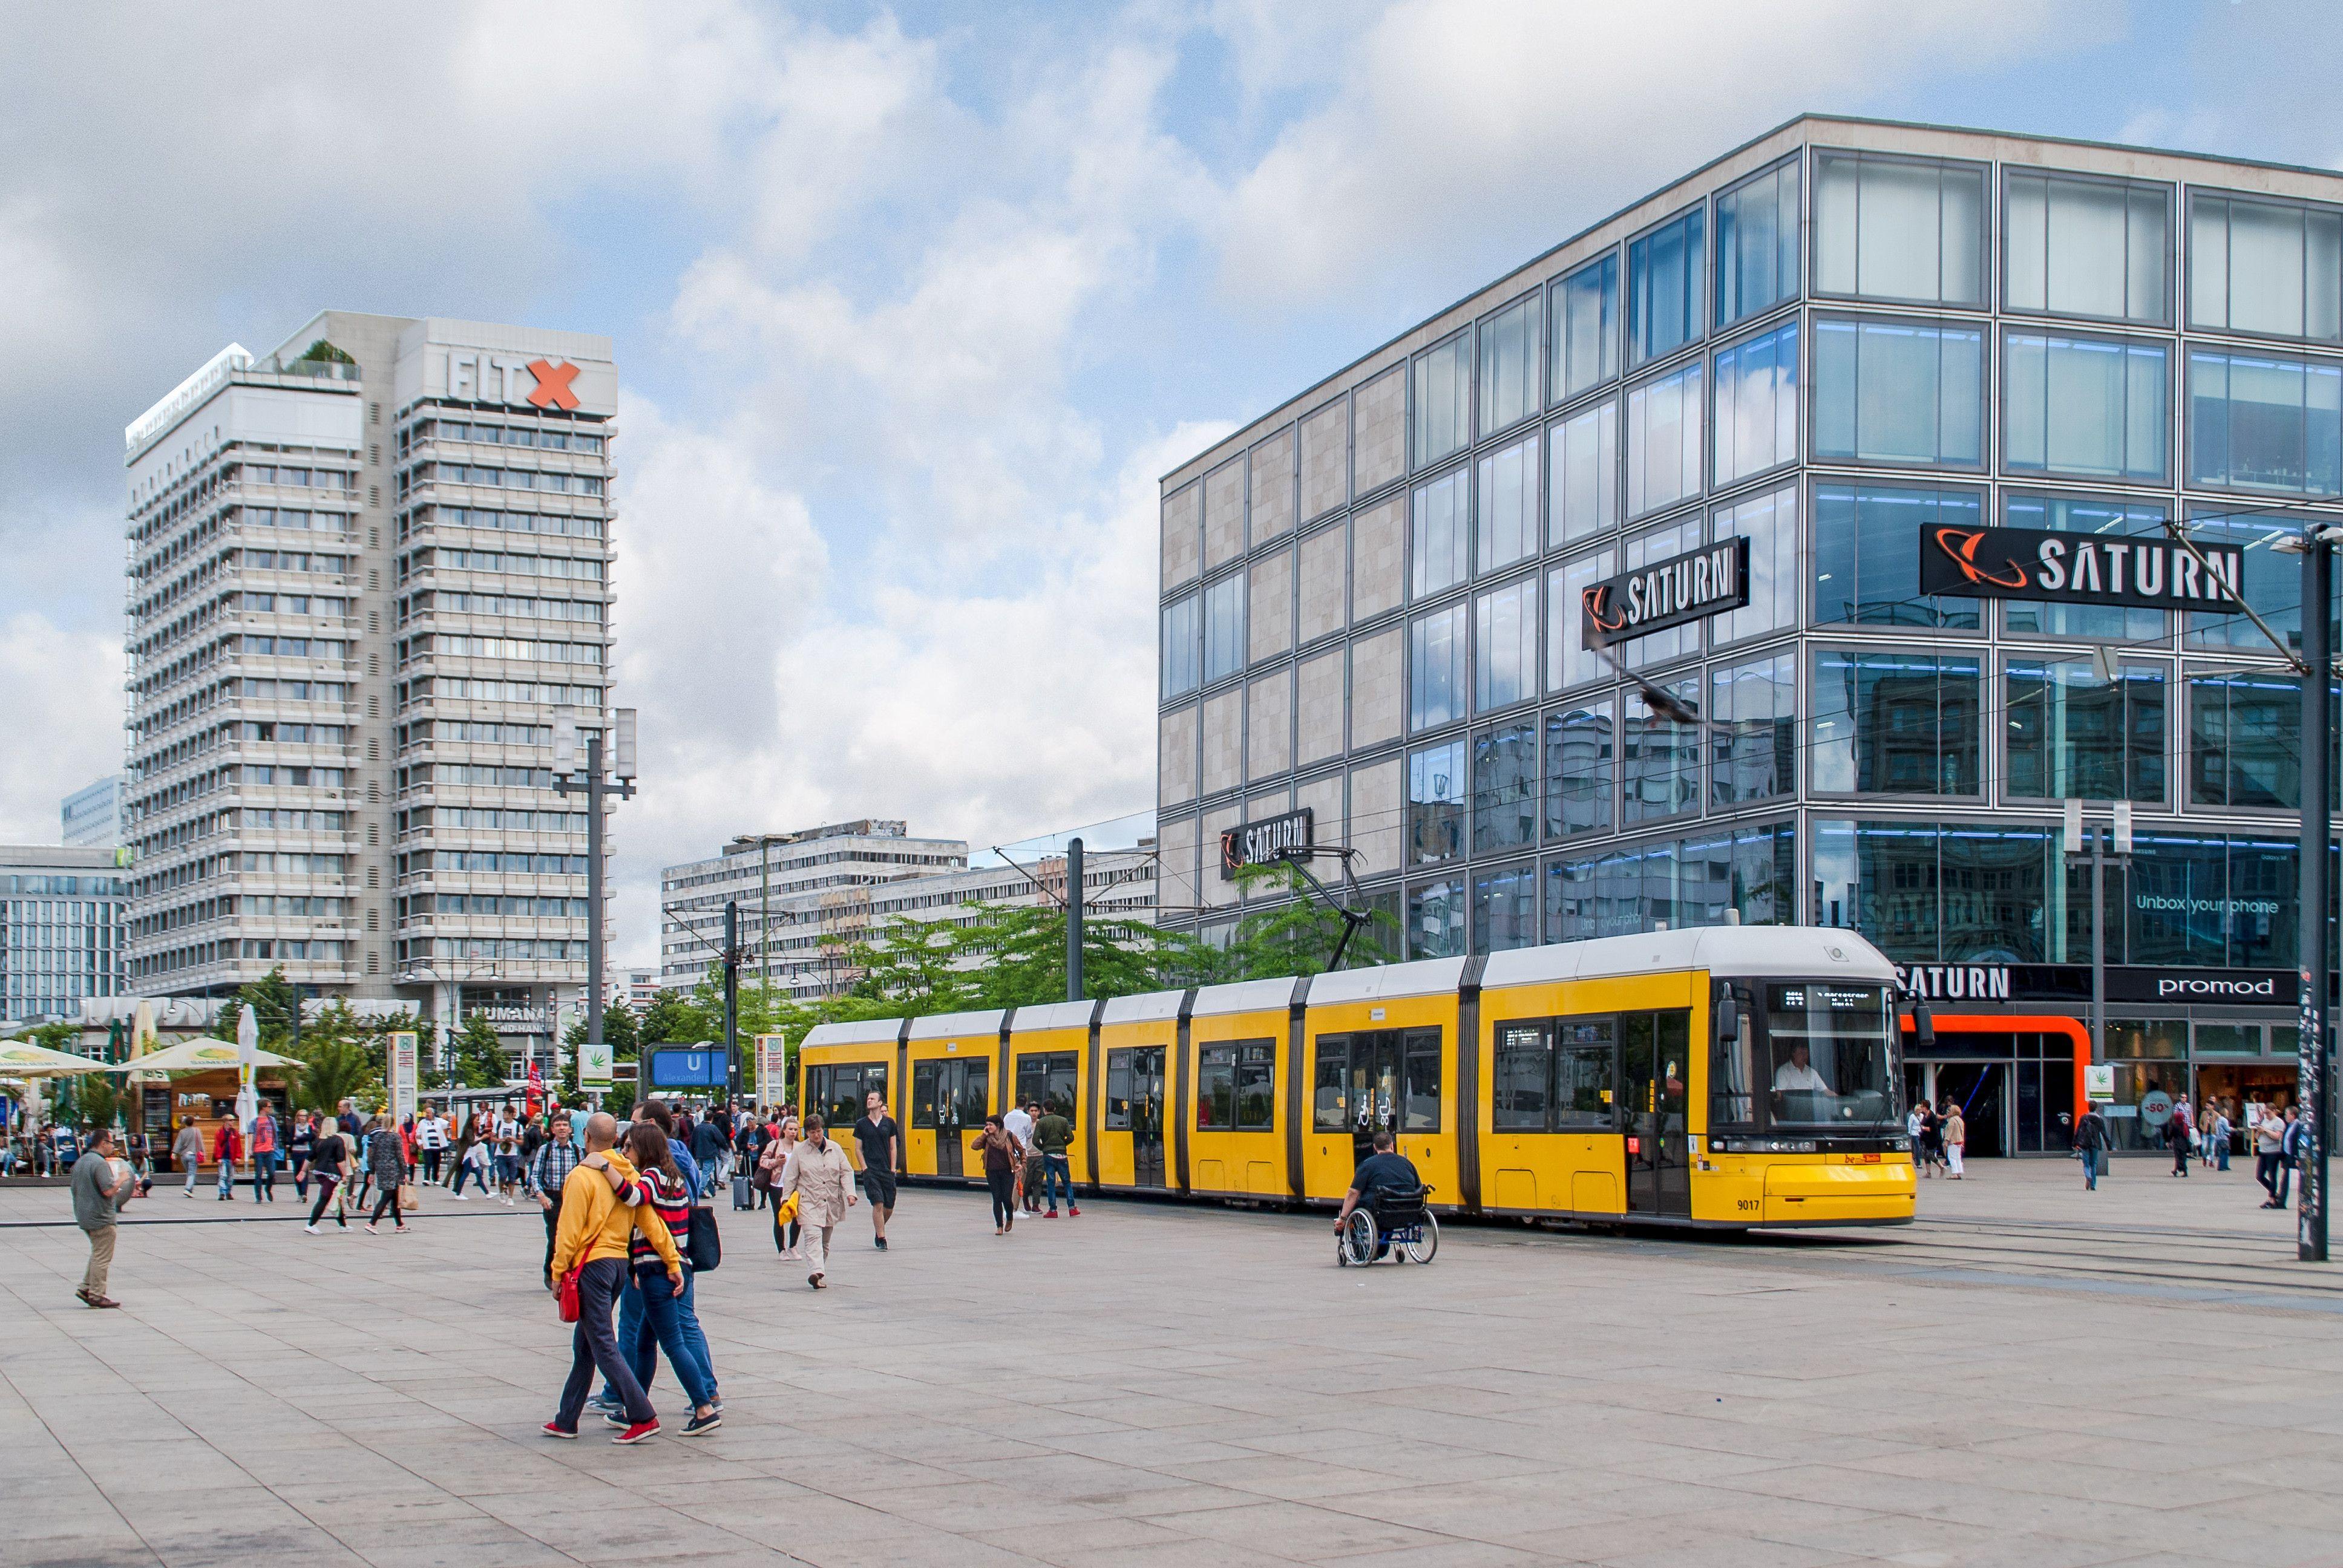 51 Alexanderplatz Strassenbahn In 2020 Facade Street View Scenes